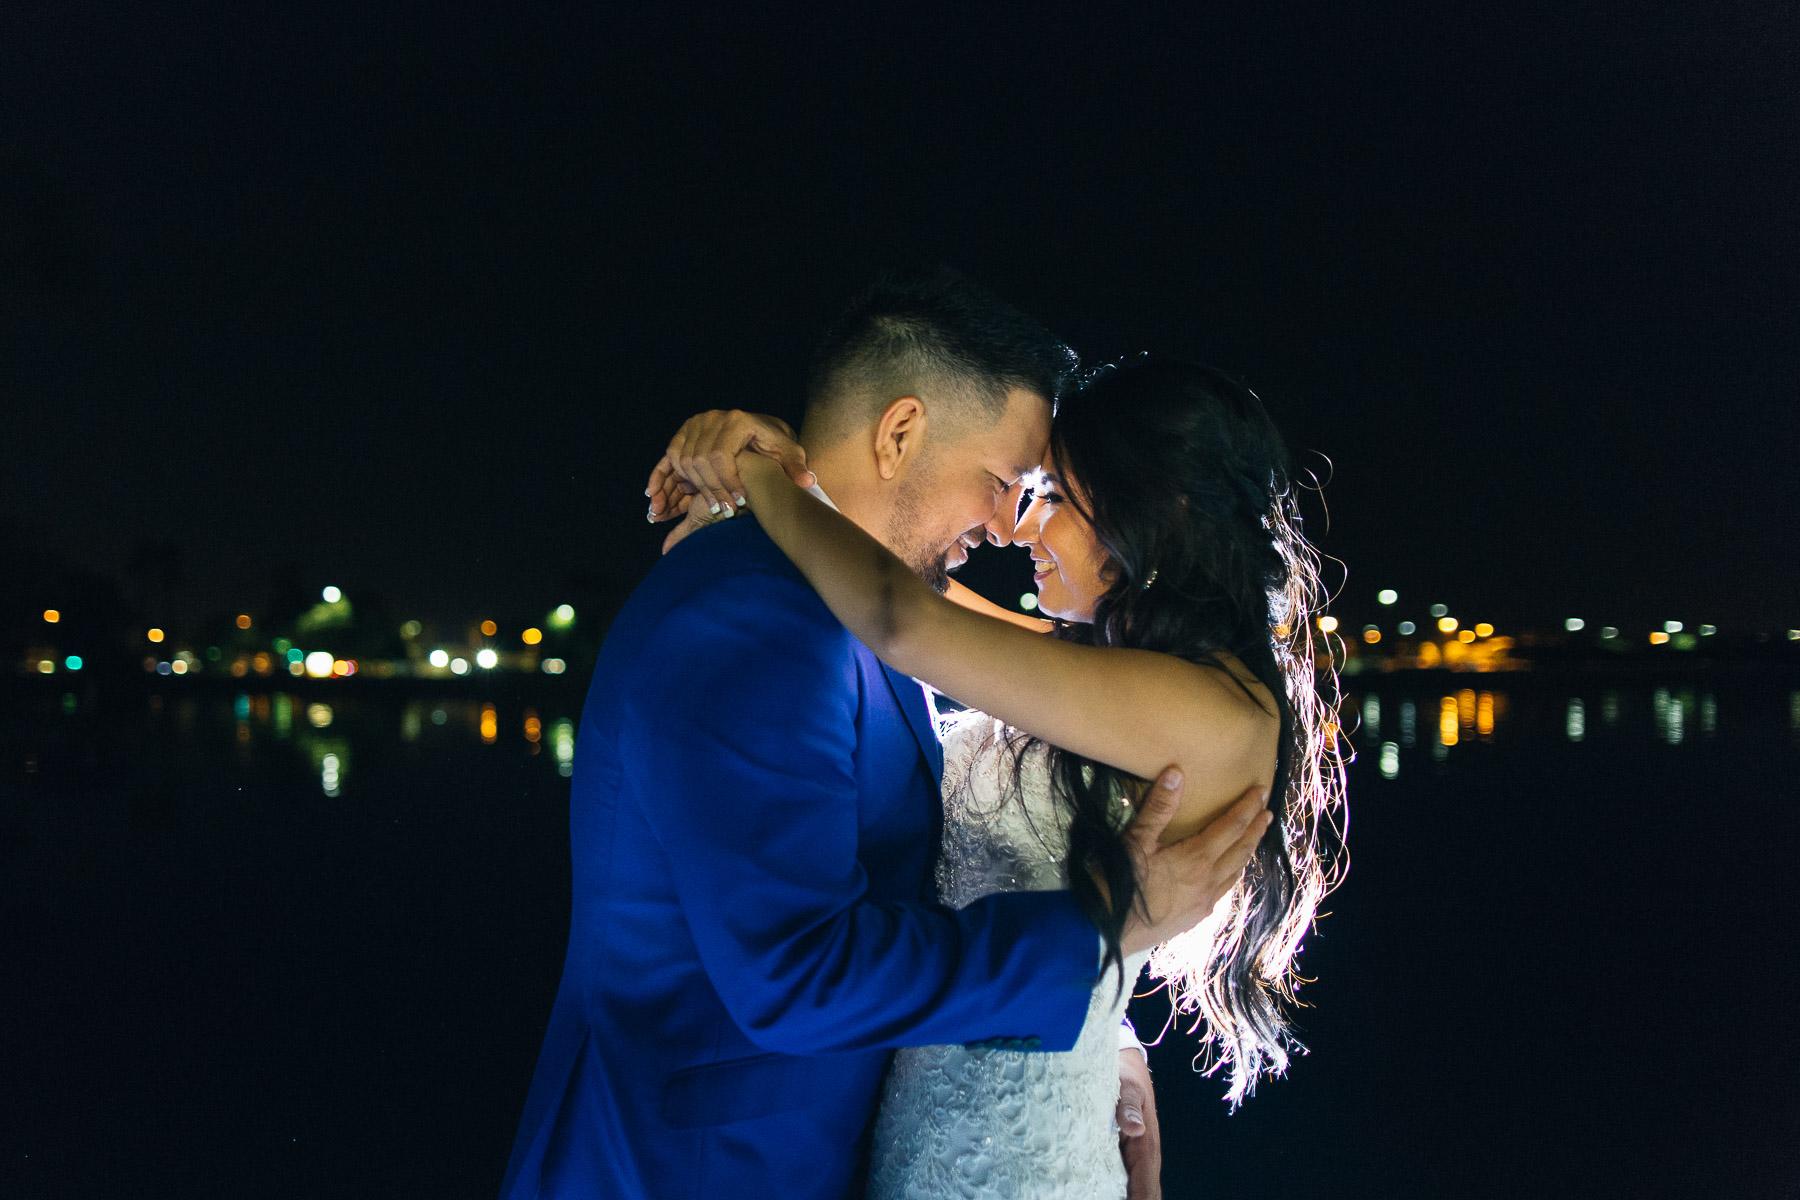 161029-Luxium-Weddings-Arizona-Jeff-Griselda-First-Look-Val-Vista-Lakes-Gilber-087b.jpg